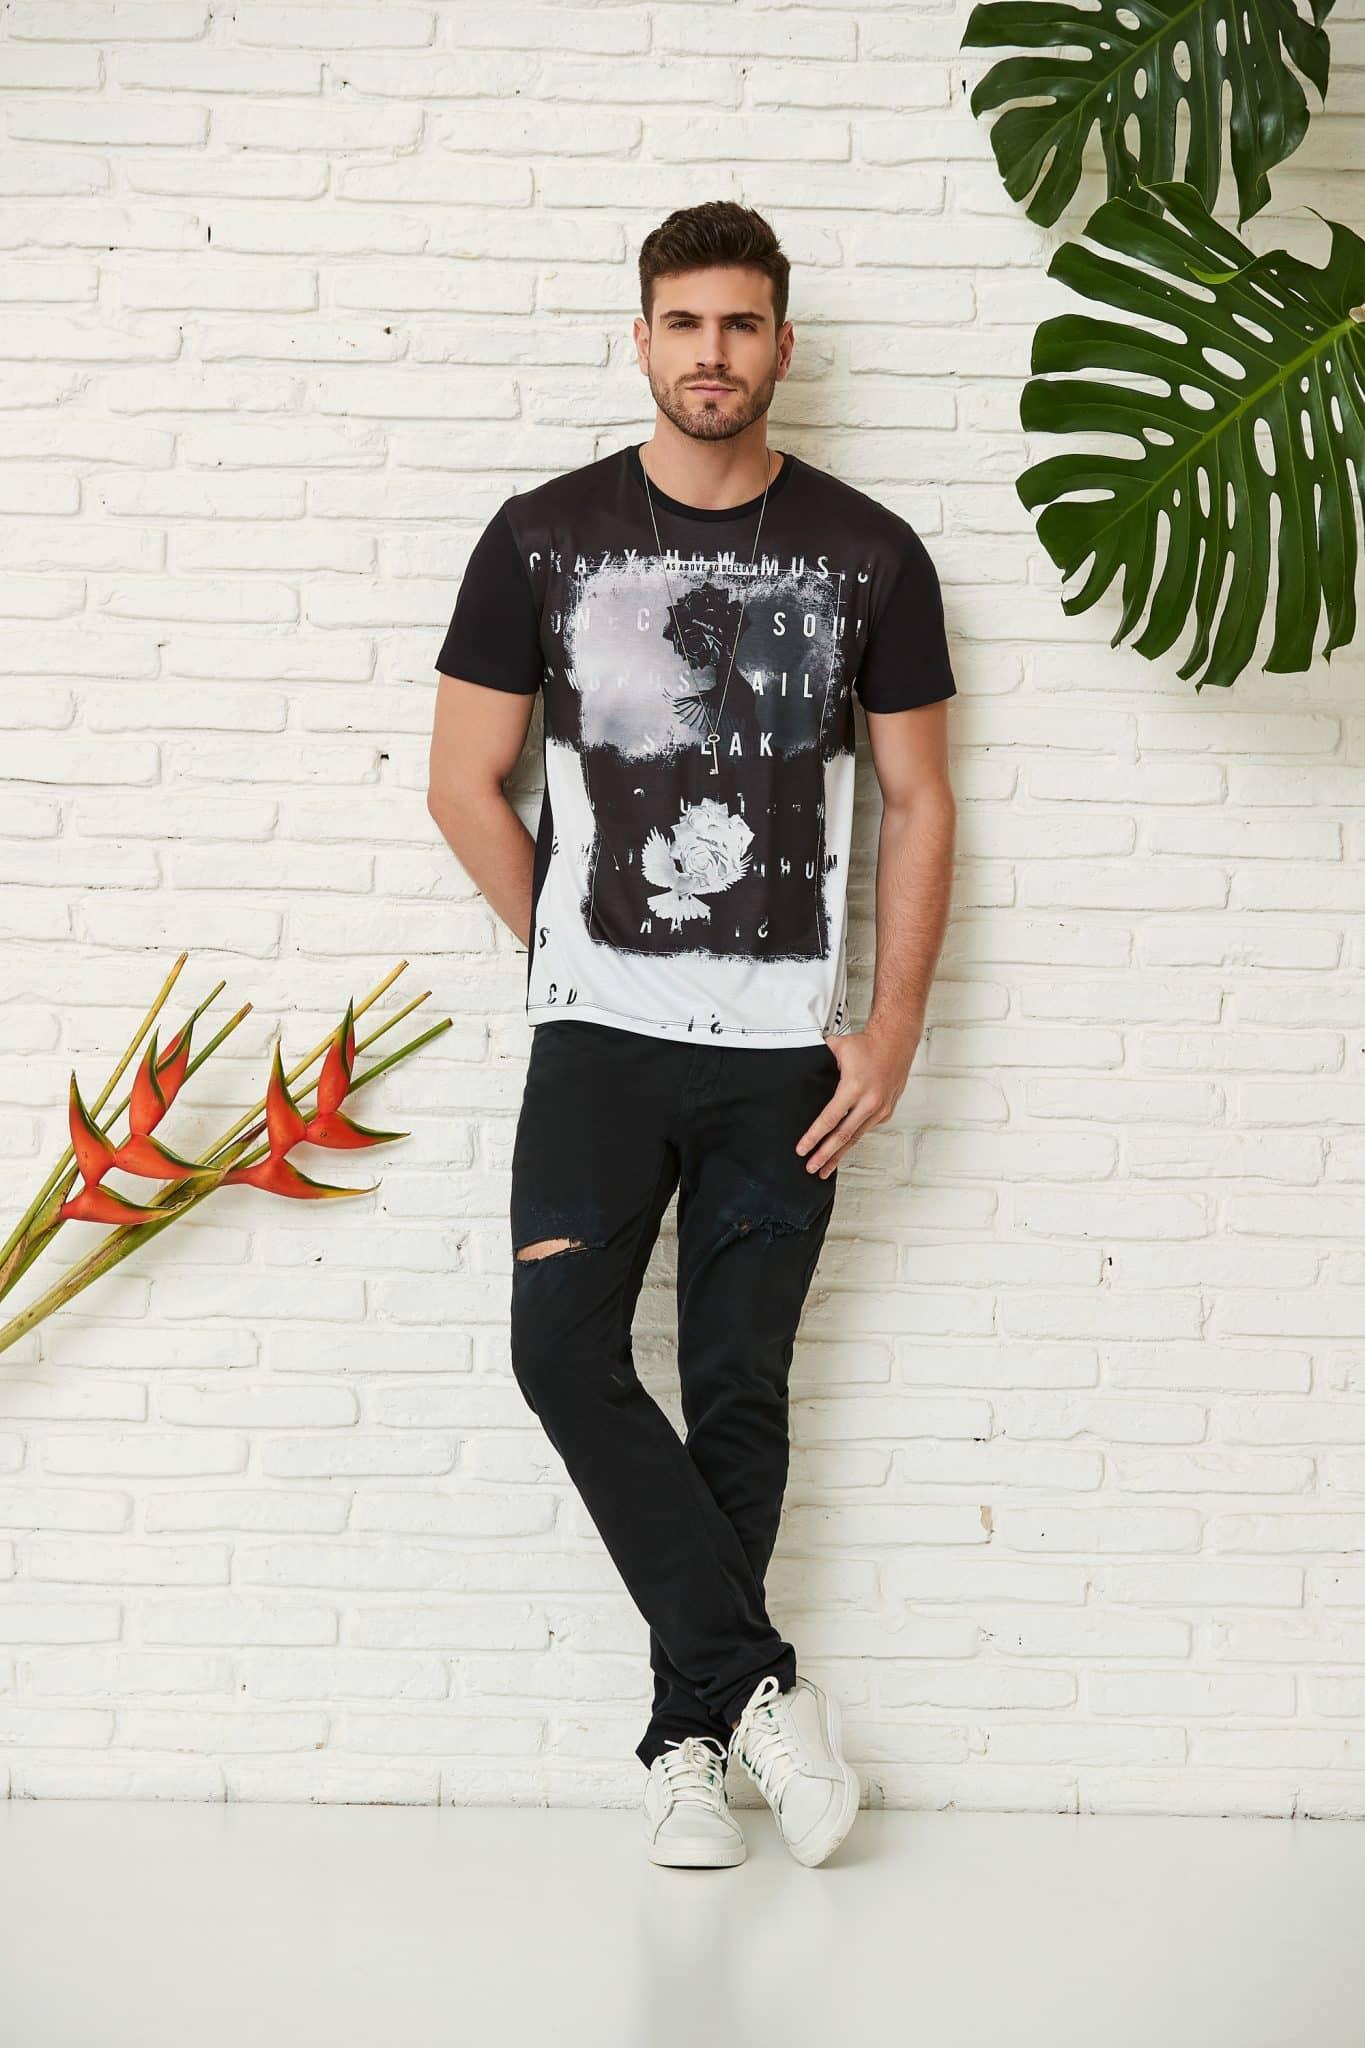 roupas masculinas no estilo rock